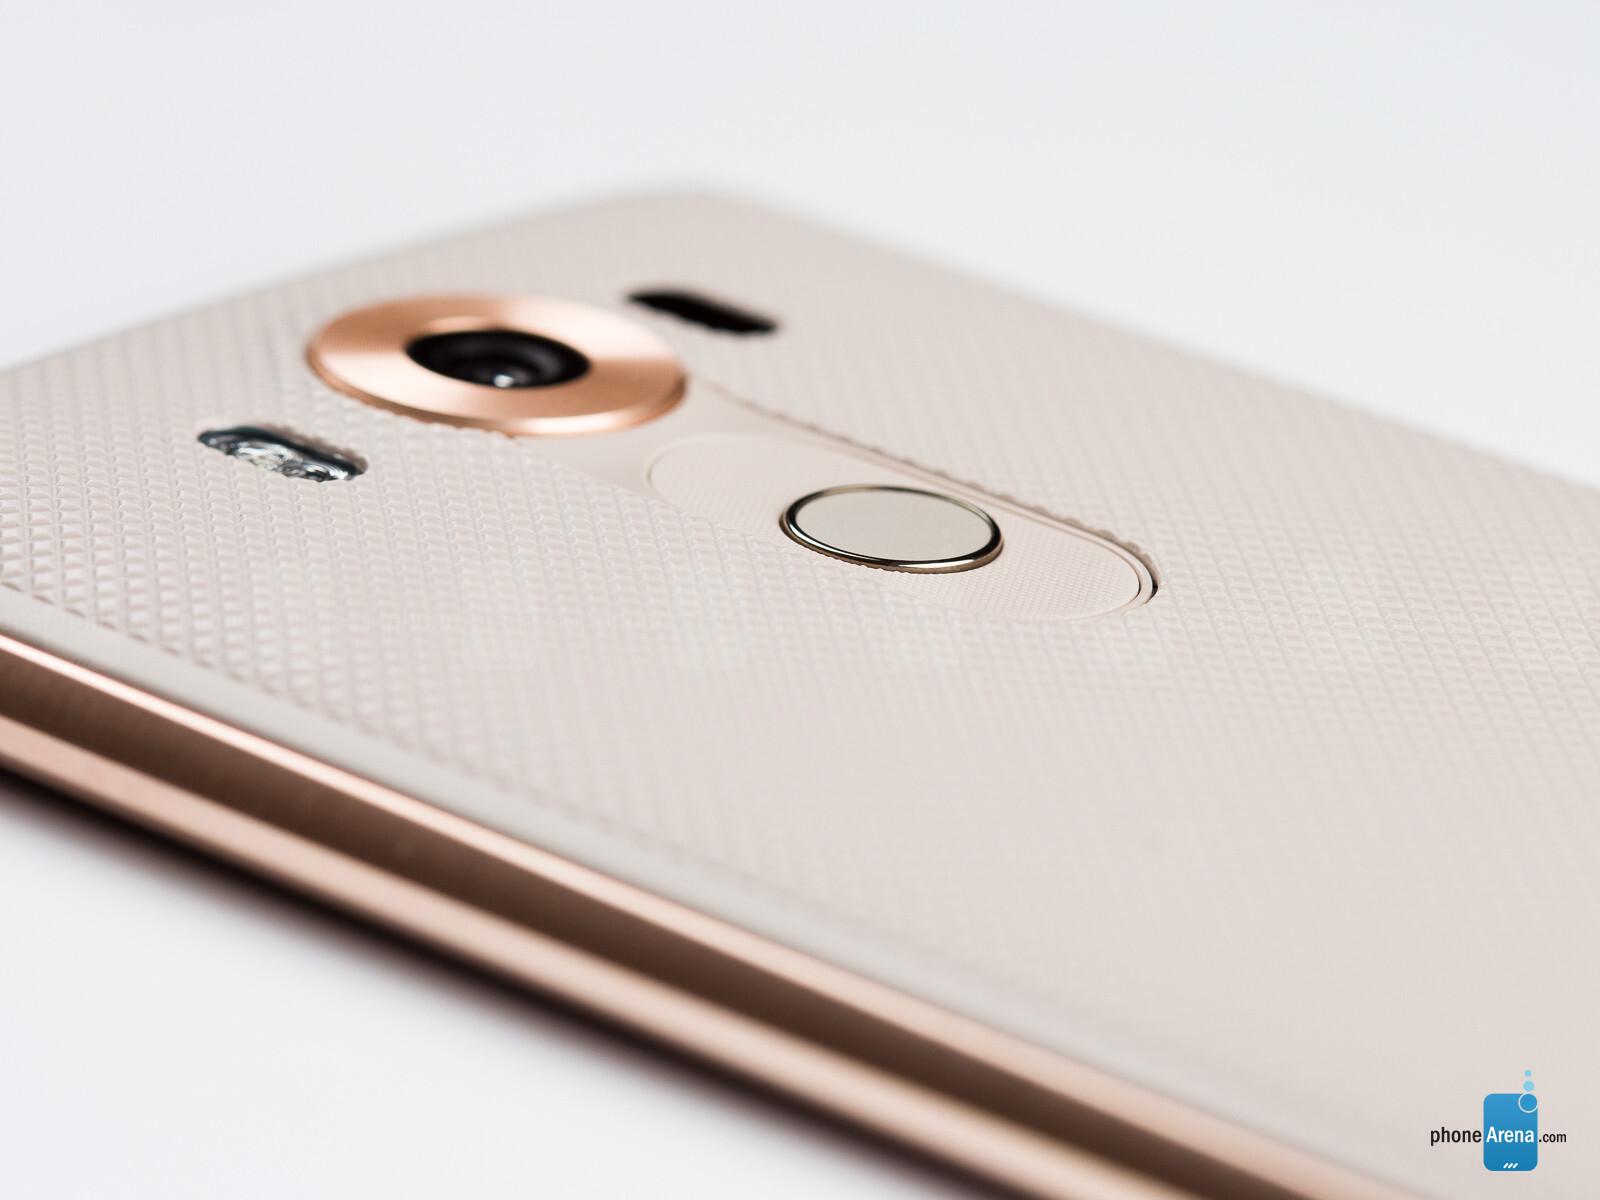 LG V10 vs Samsung Galaxy Note 5: the user experience #2679A5